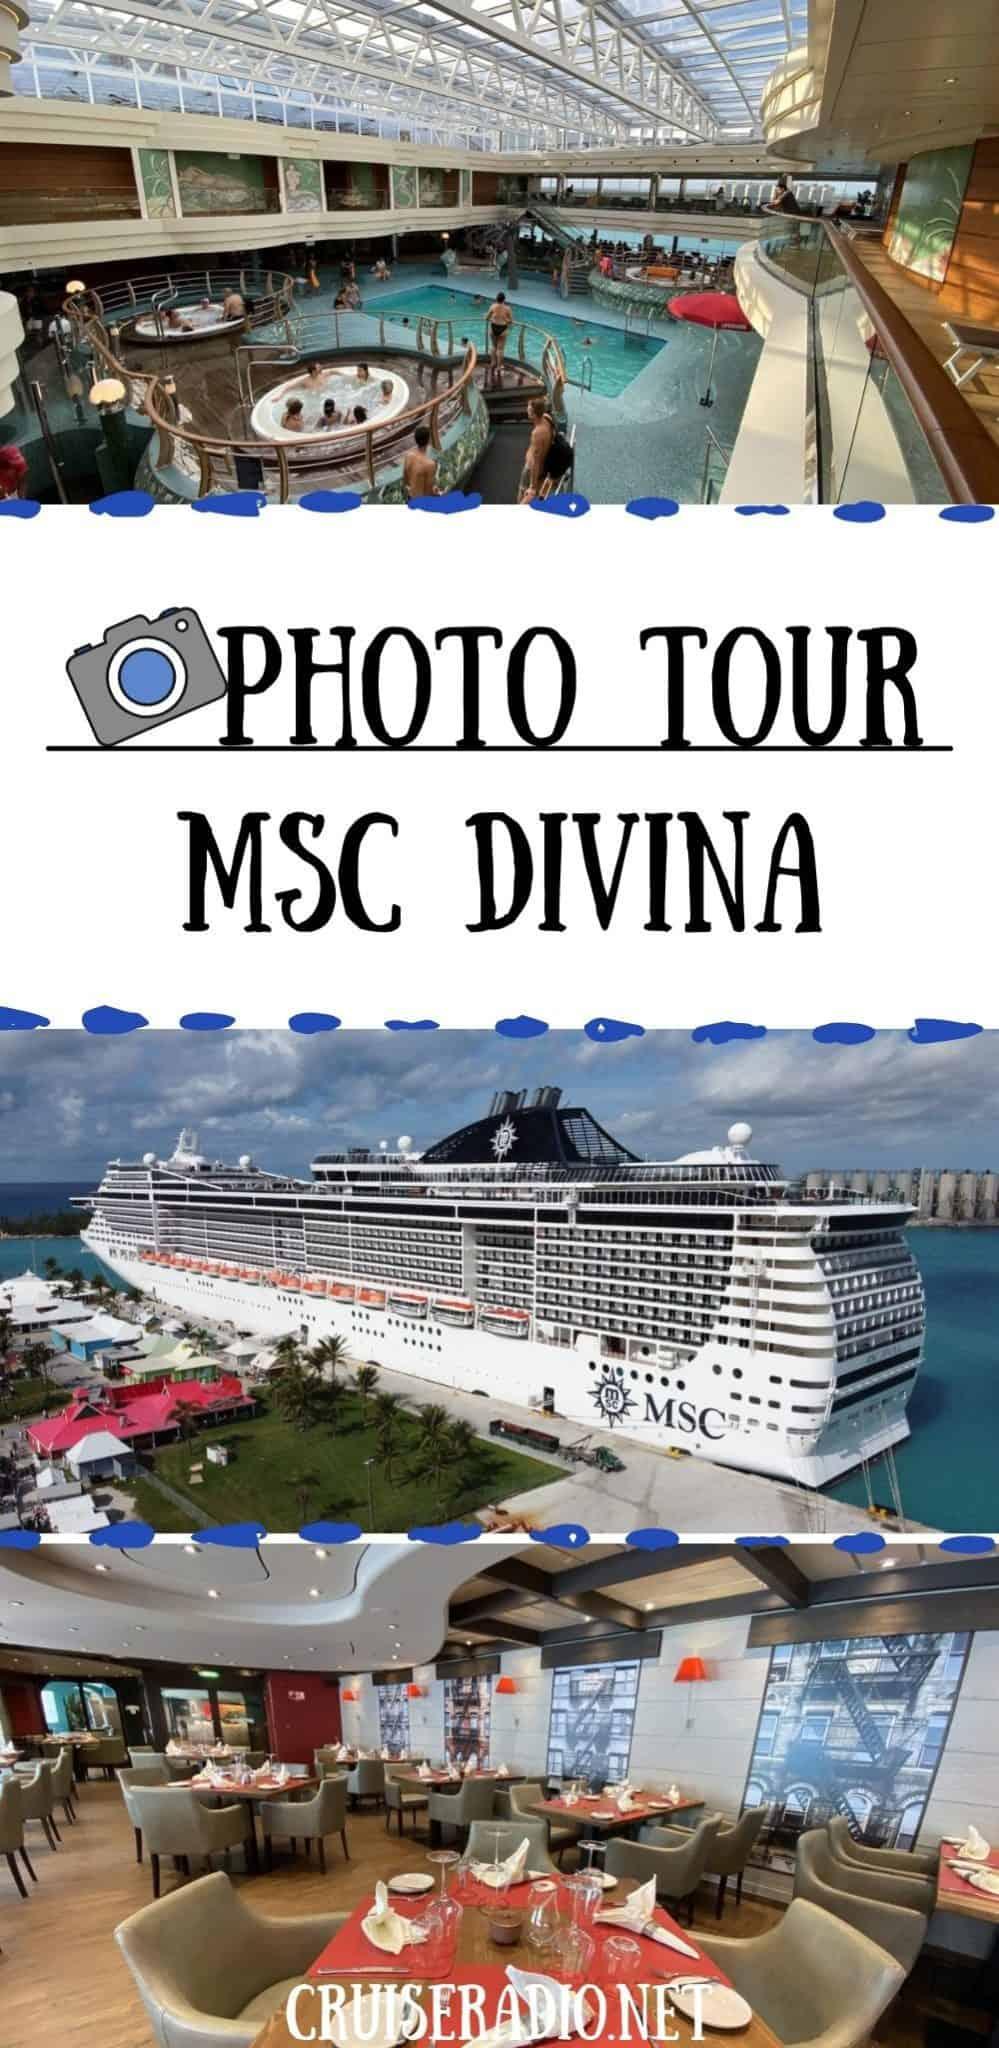 photo tour msc divina